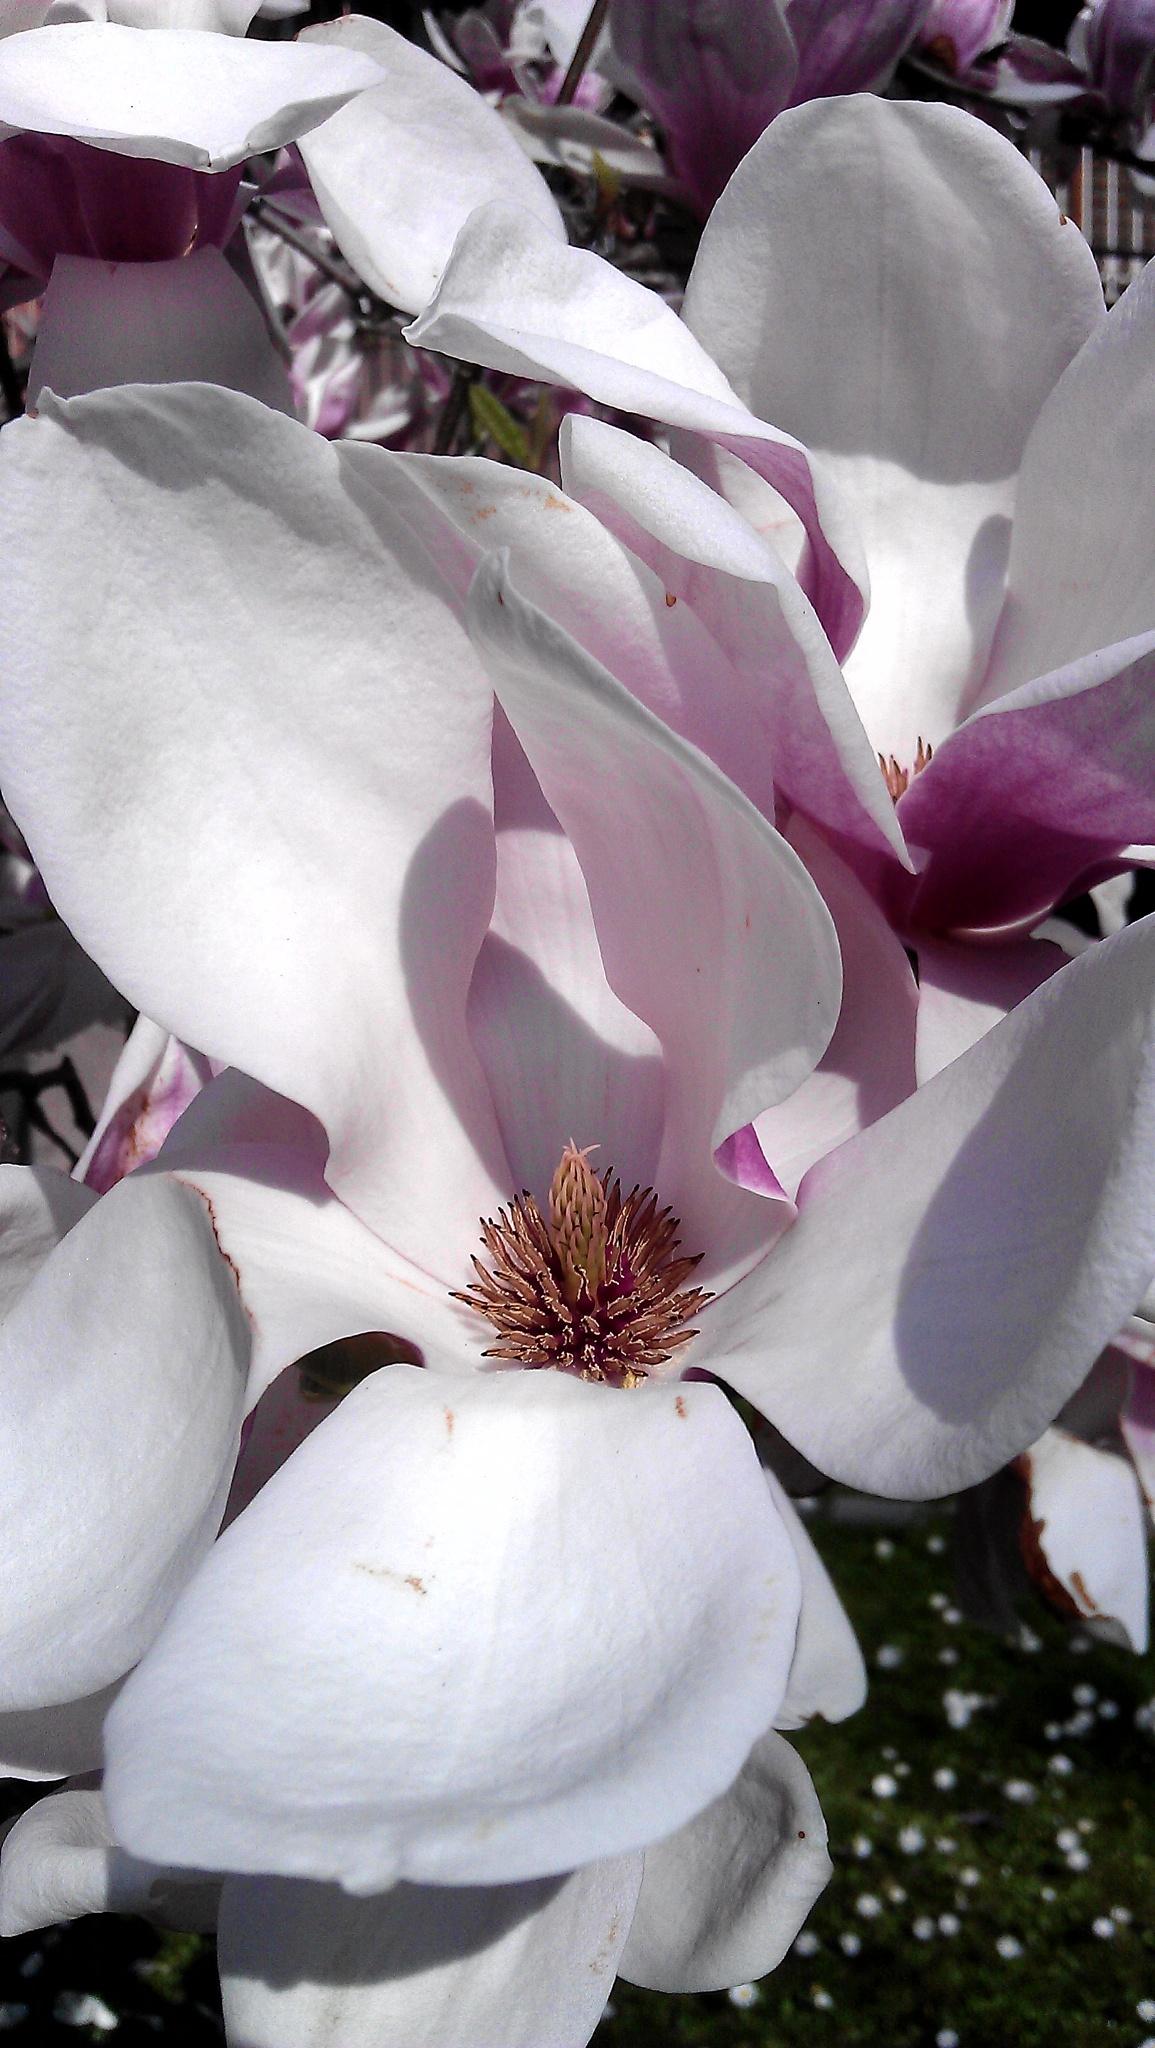 Magnolia rosa. by Paolo Pasquali